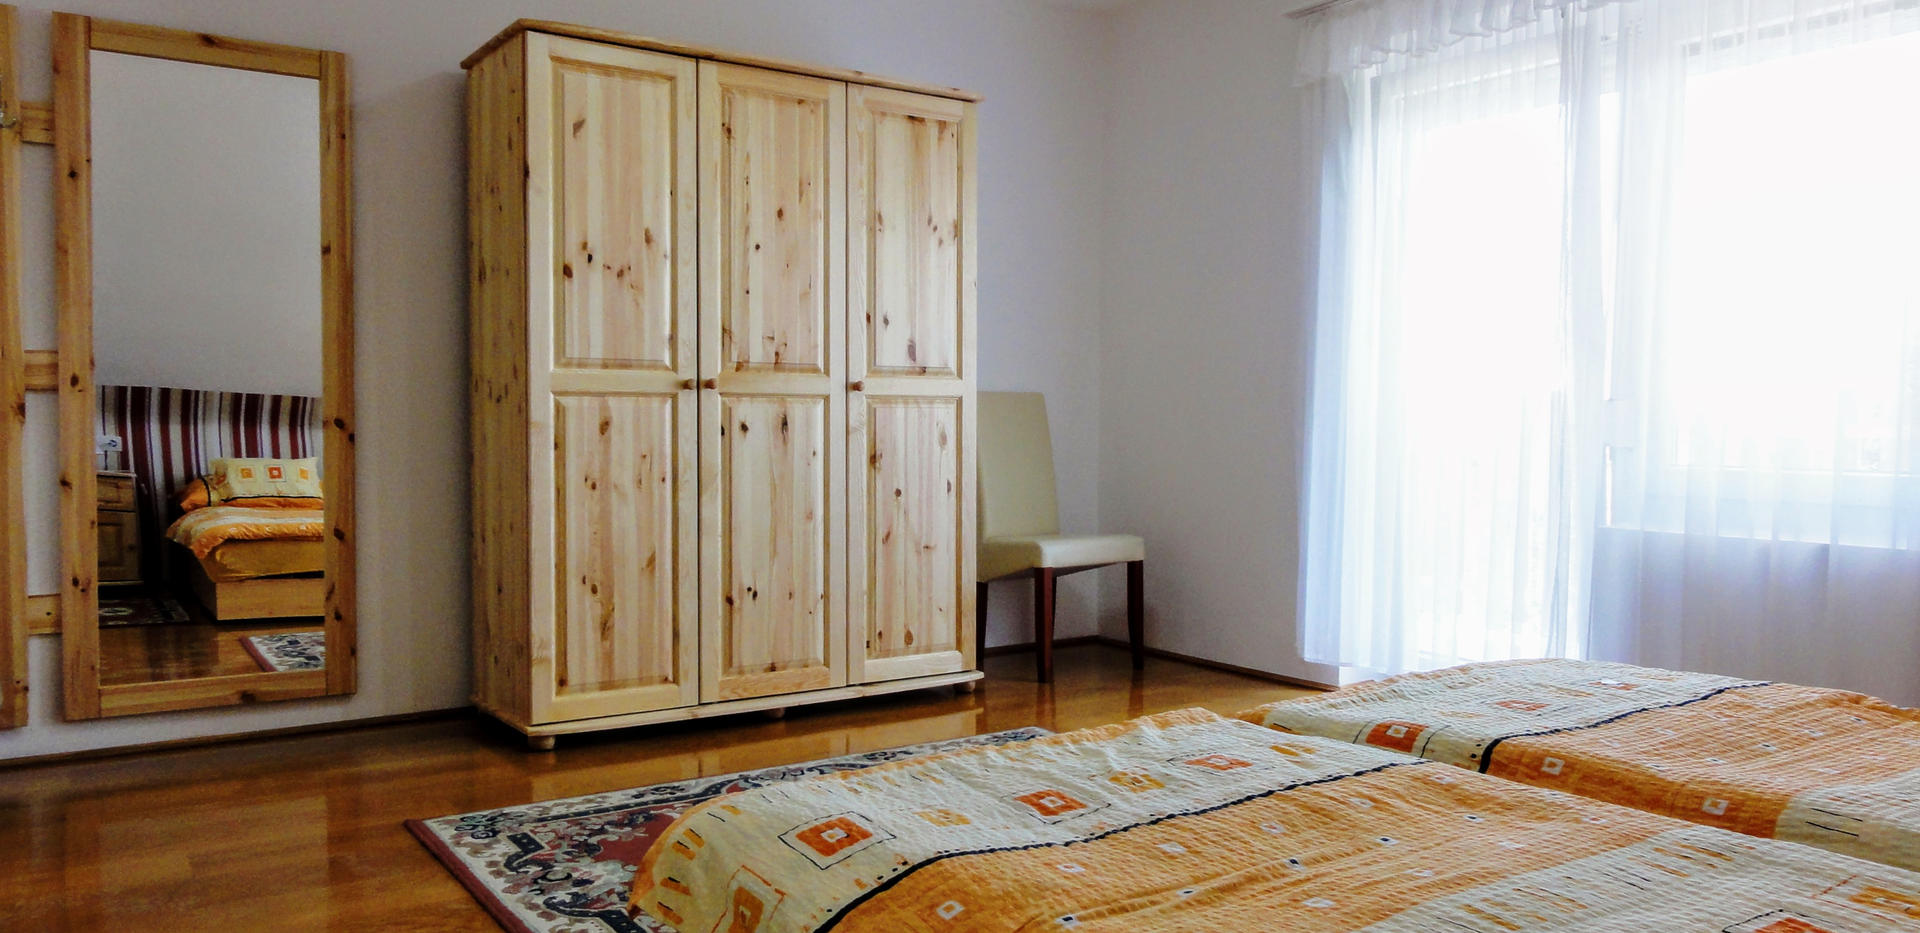 Zalakaros_4-es Ház_6-os apartman